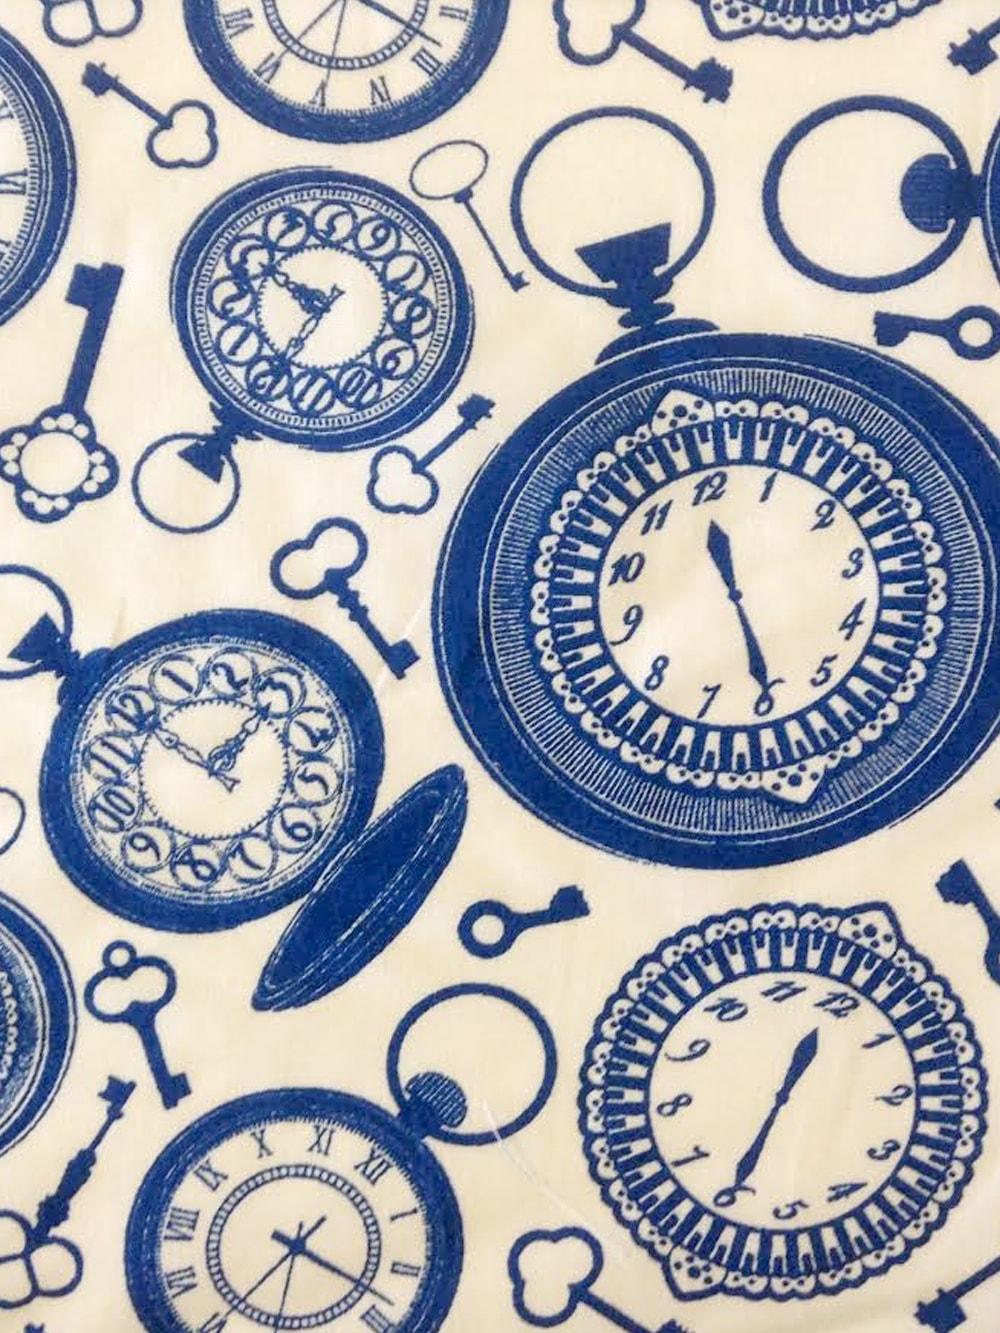 Pin by Carolyn Bridges-Brown on Pocket watches   Pocket ...